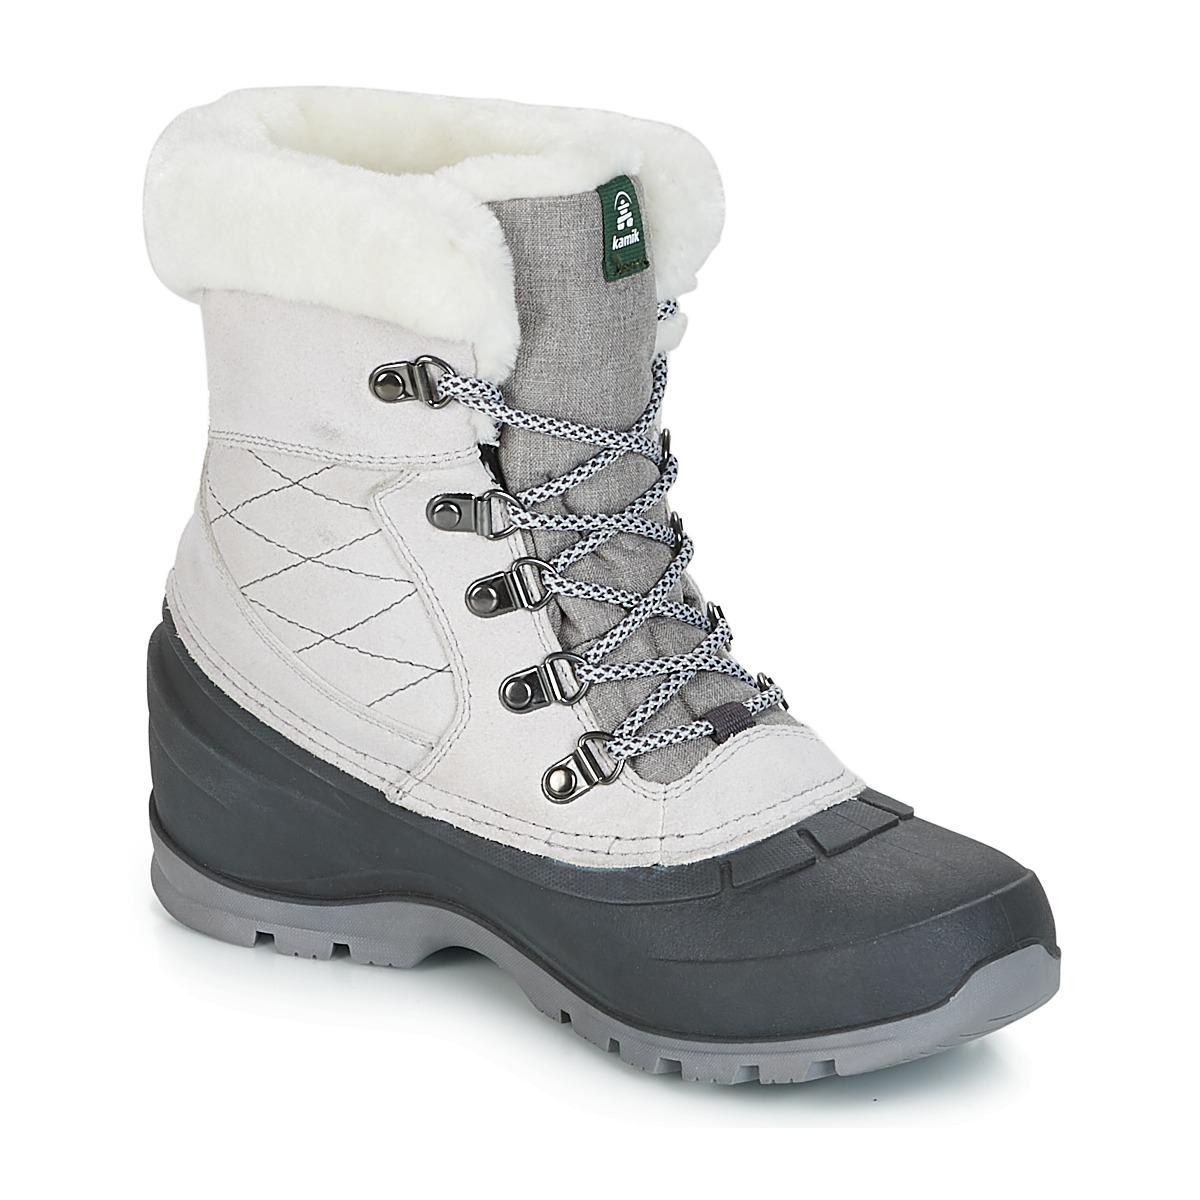 1372090ee1b Kamik Snowalley L Women's Snow Boots In Grey in Gray - Lyst